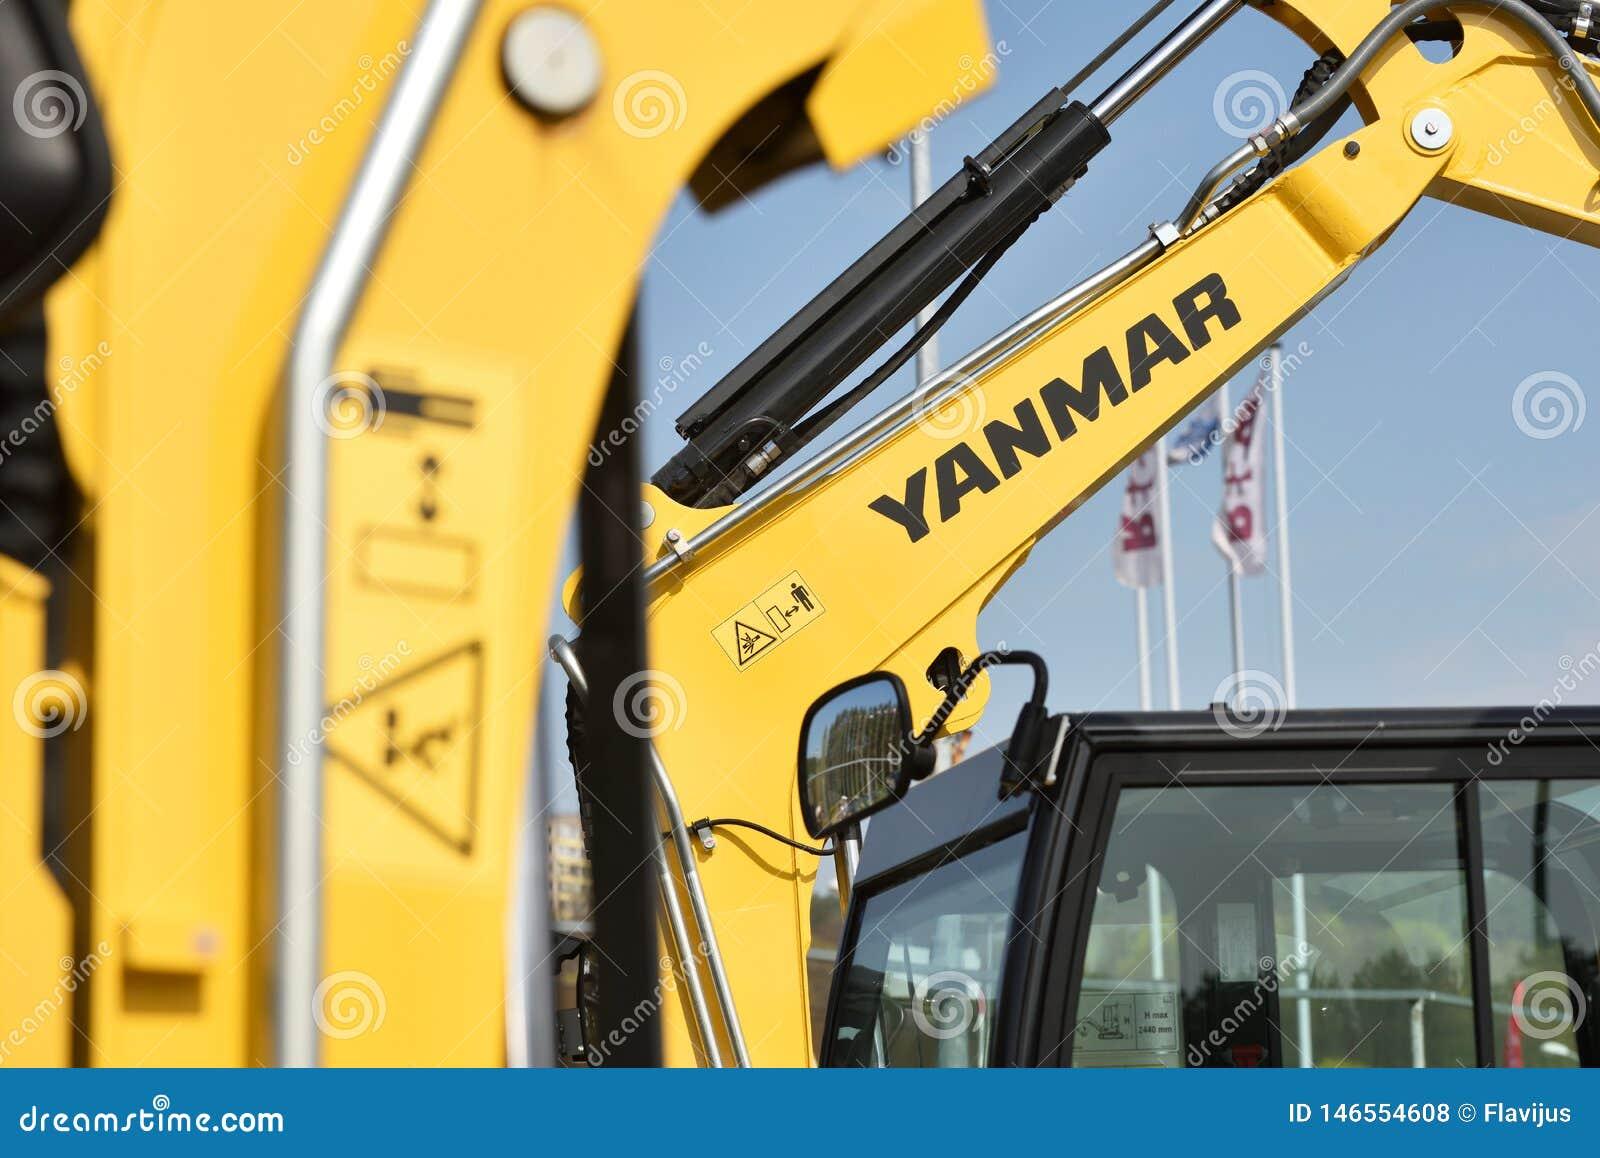 Yanmar excavator and logo editorial stock photo  Image of